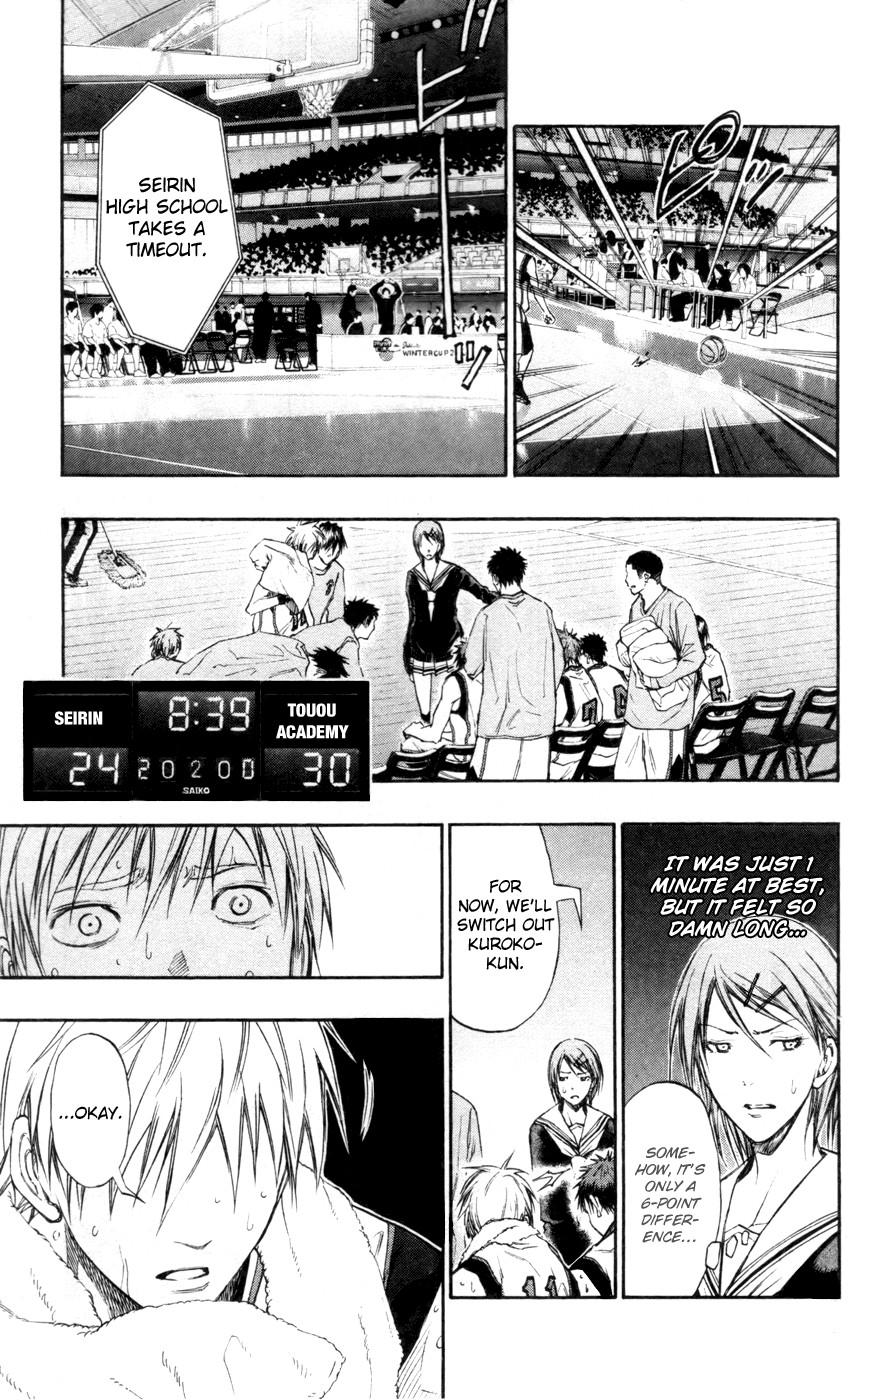 Kuroko no Basket Manga Chapter 120 - Image 15